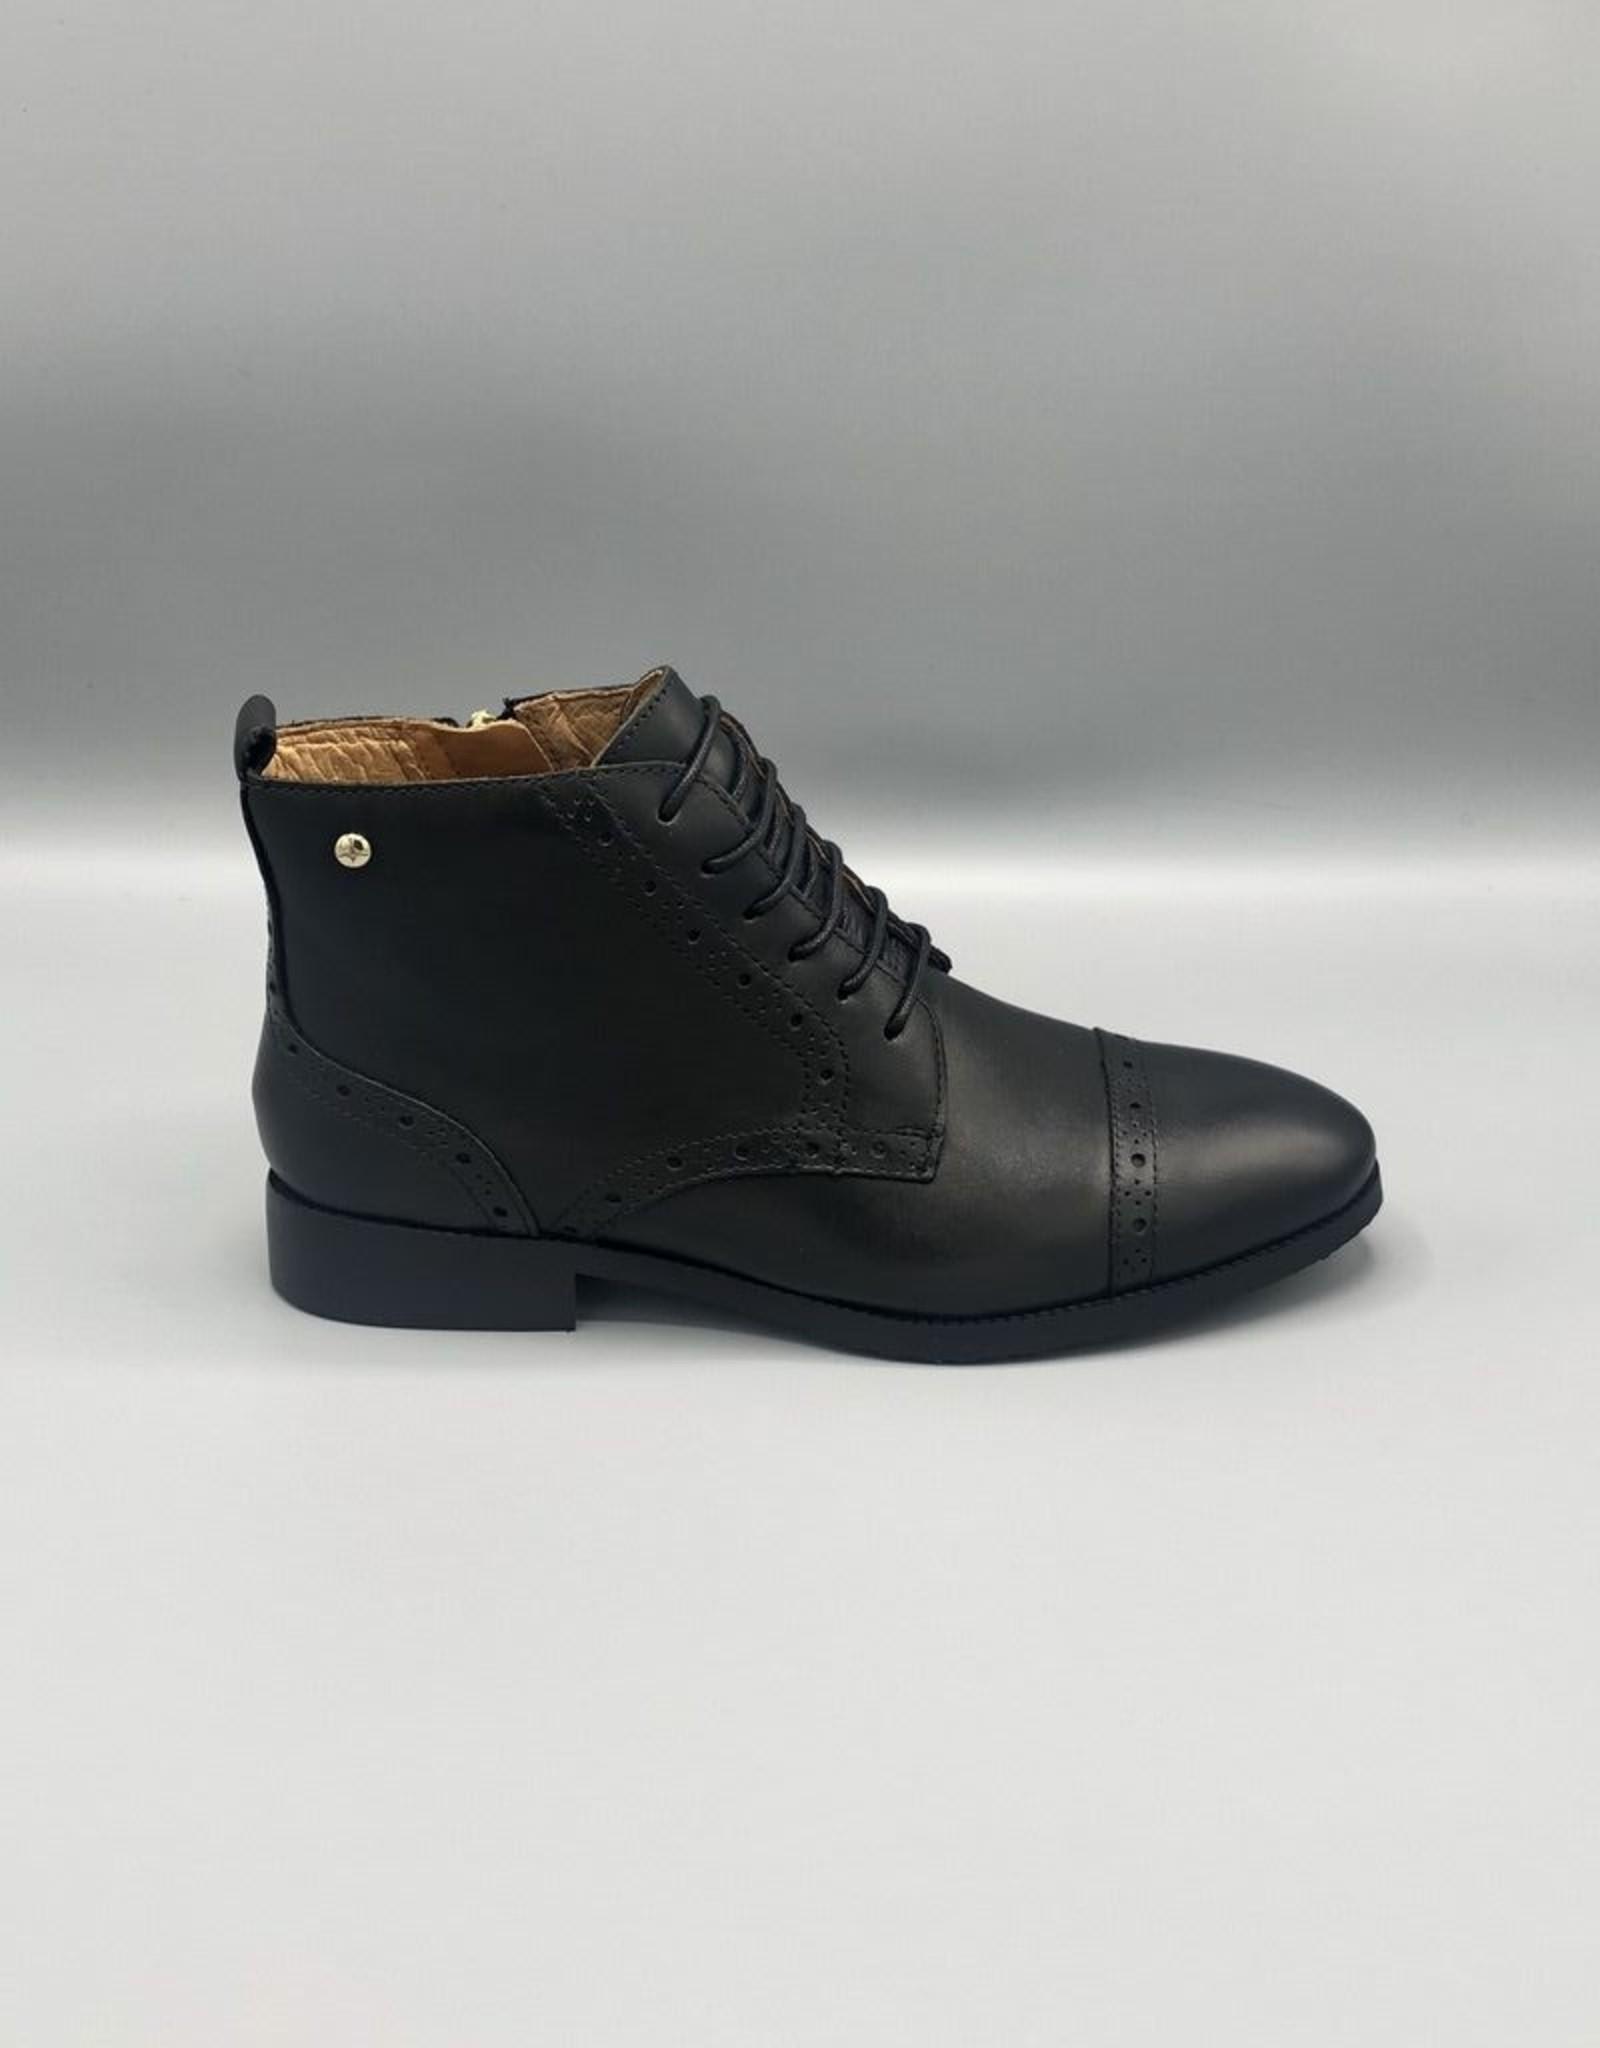 Pikolinos Pikolinos Royal Lace/Zip Leather Brogue Boot